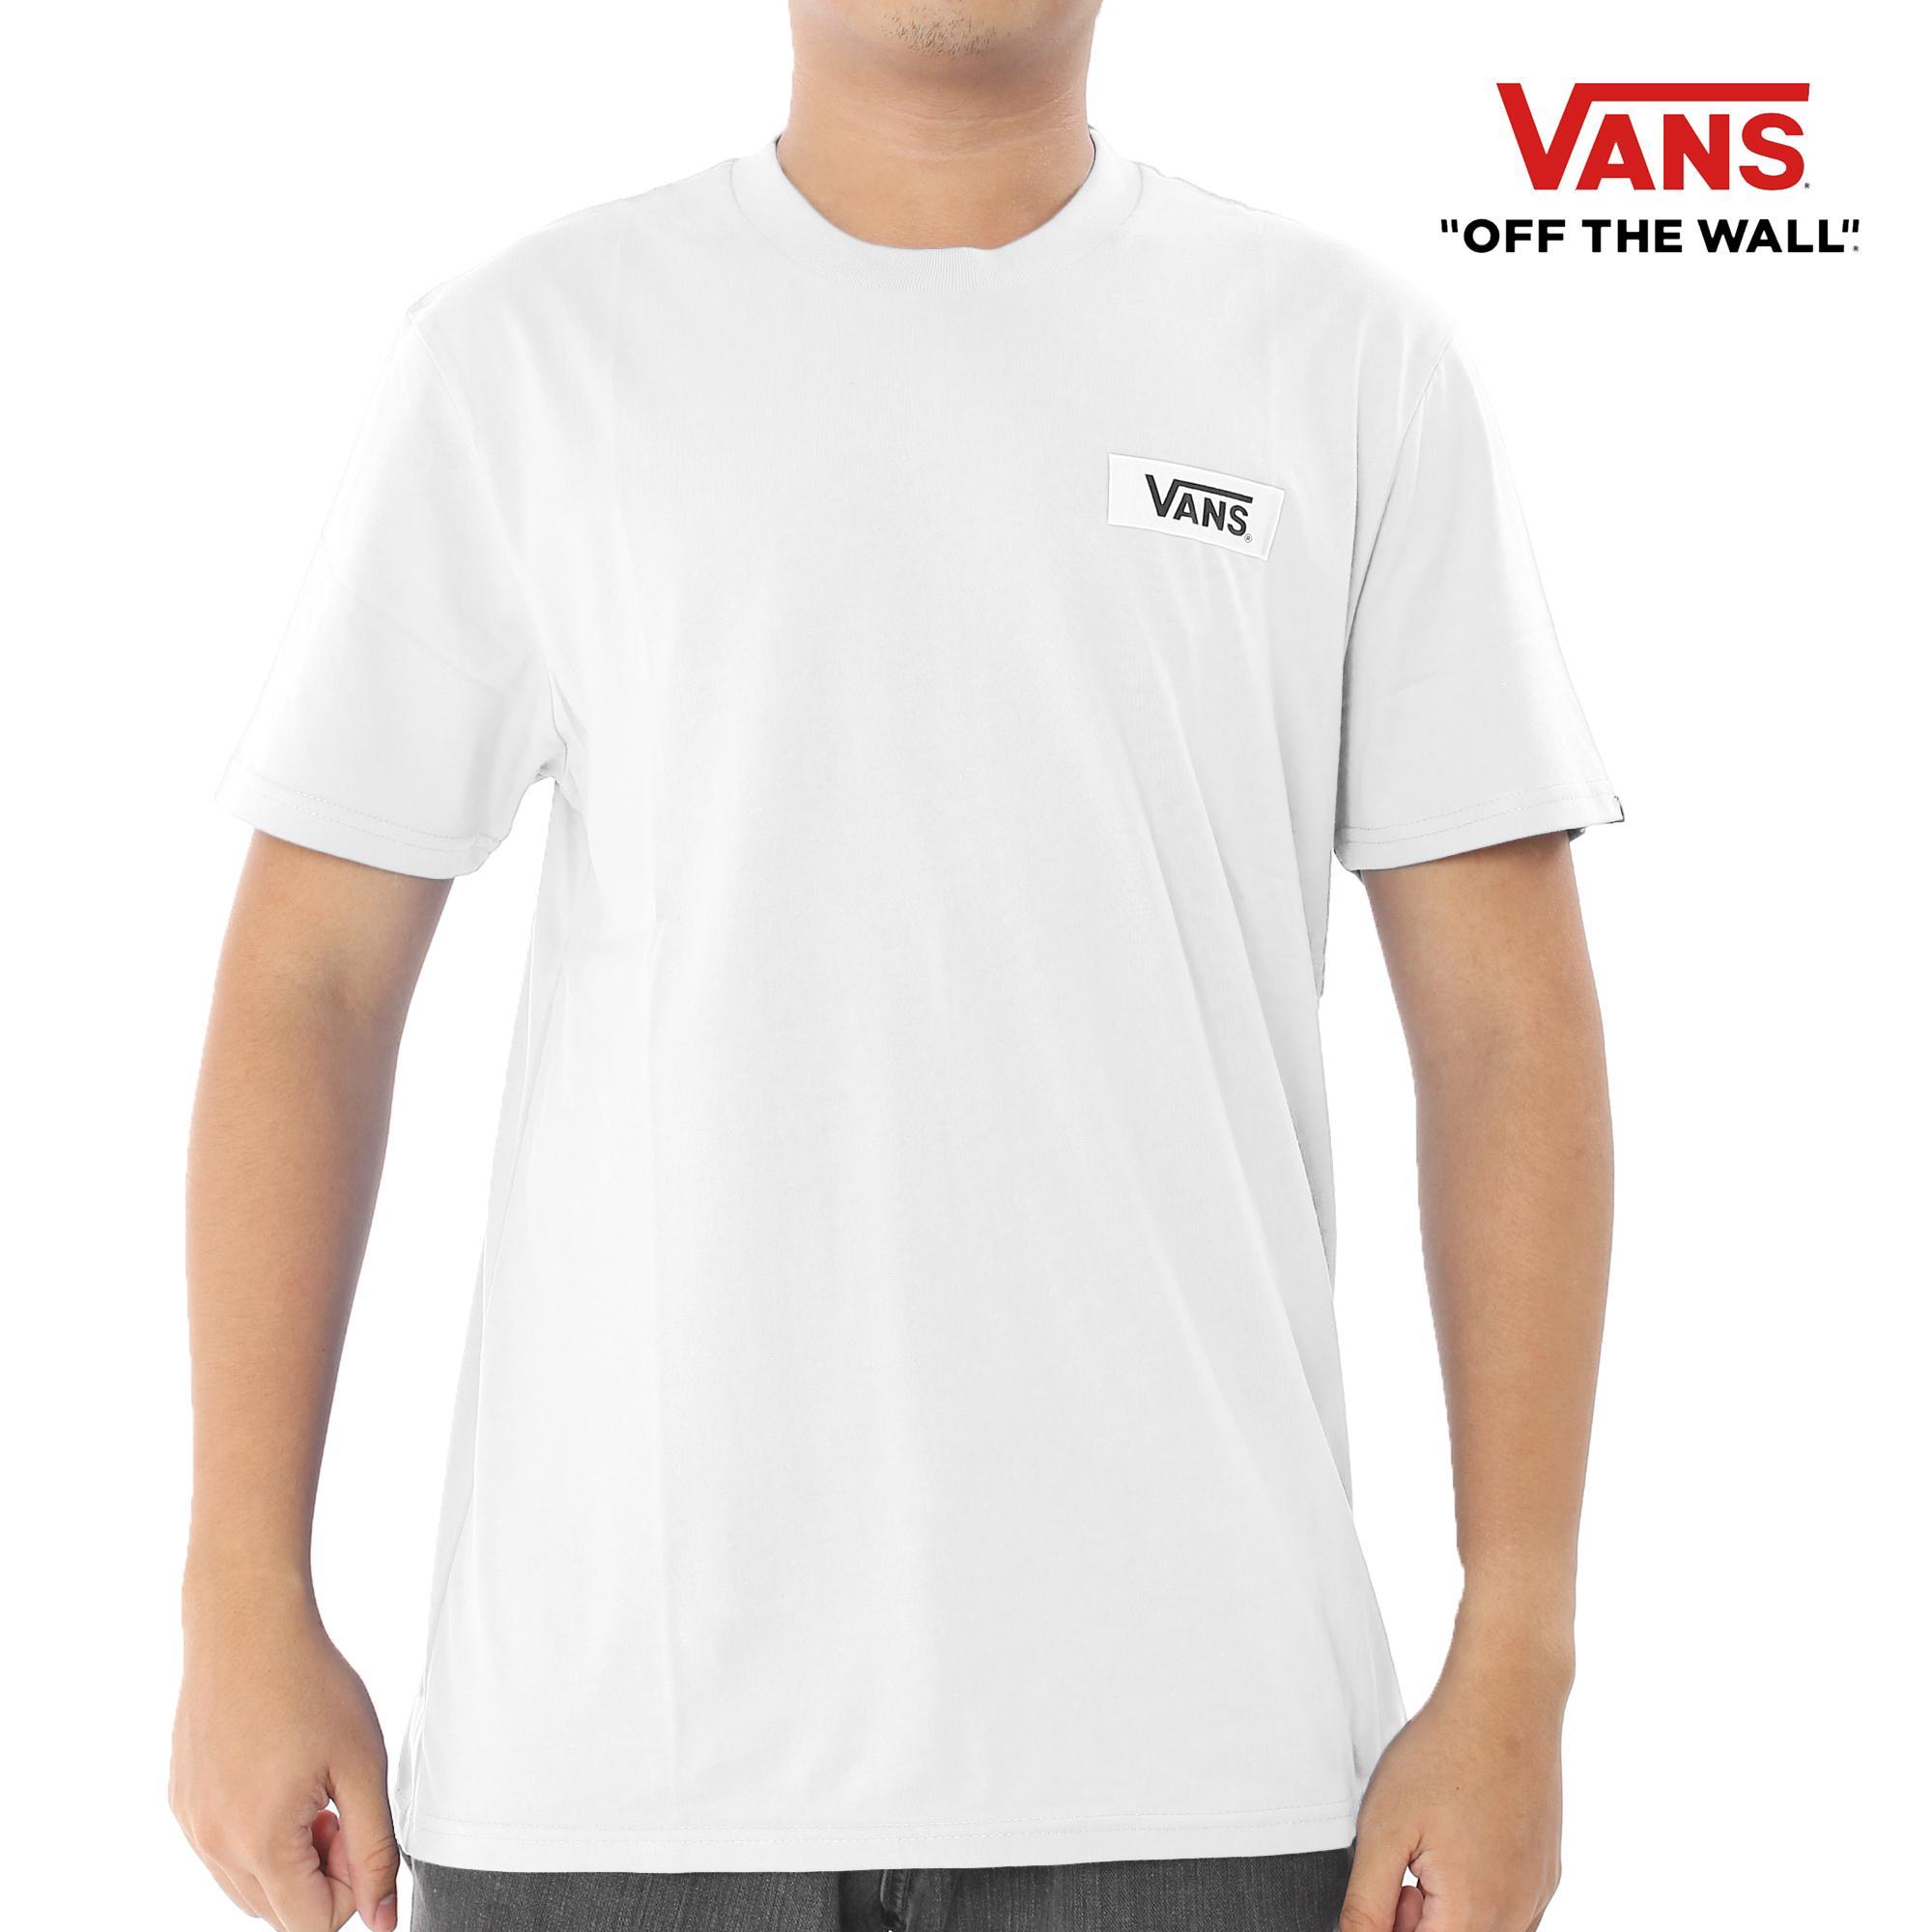 14d0bac1b6 Vans Philippines -Vans Mens Fashion for sale - prices   reviews